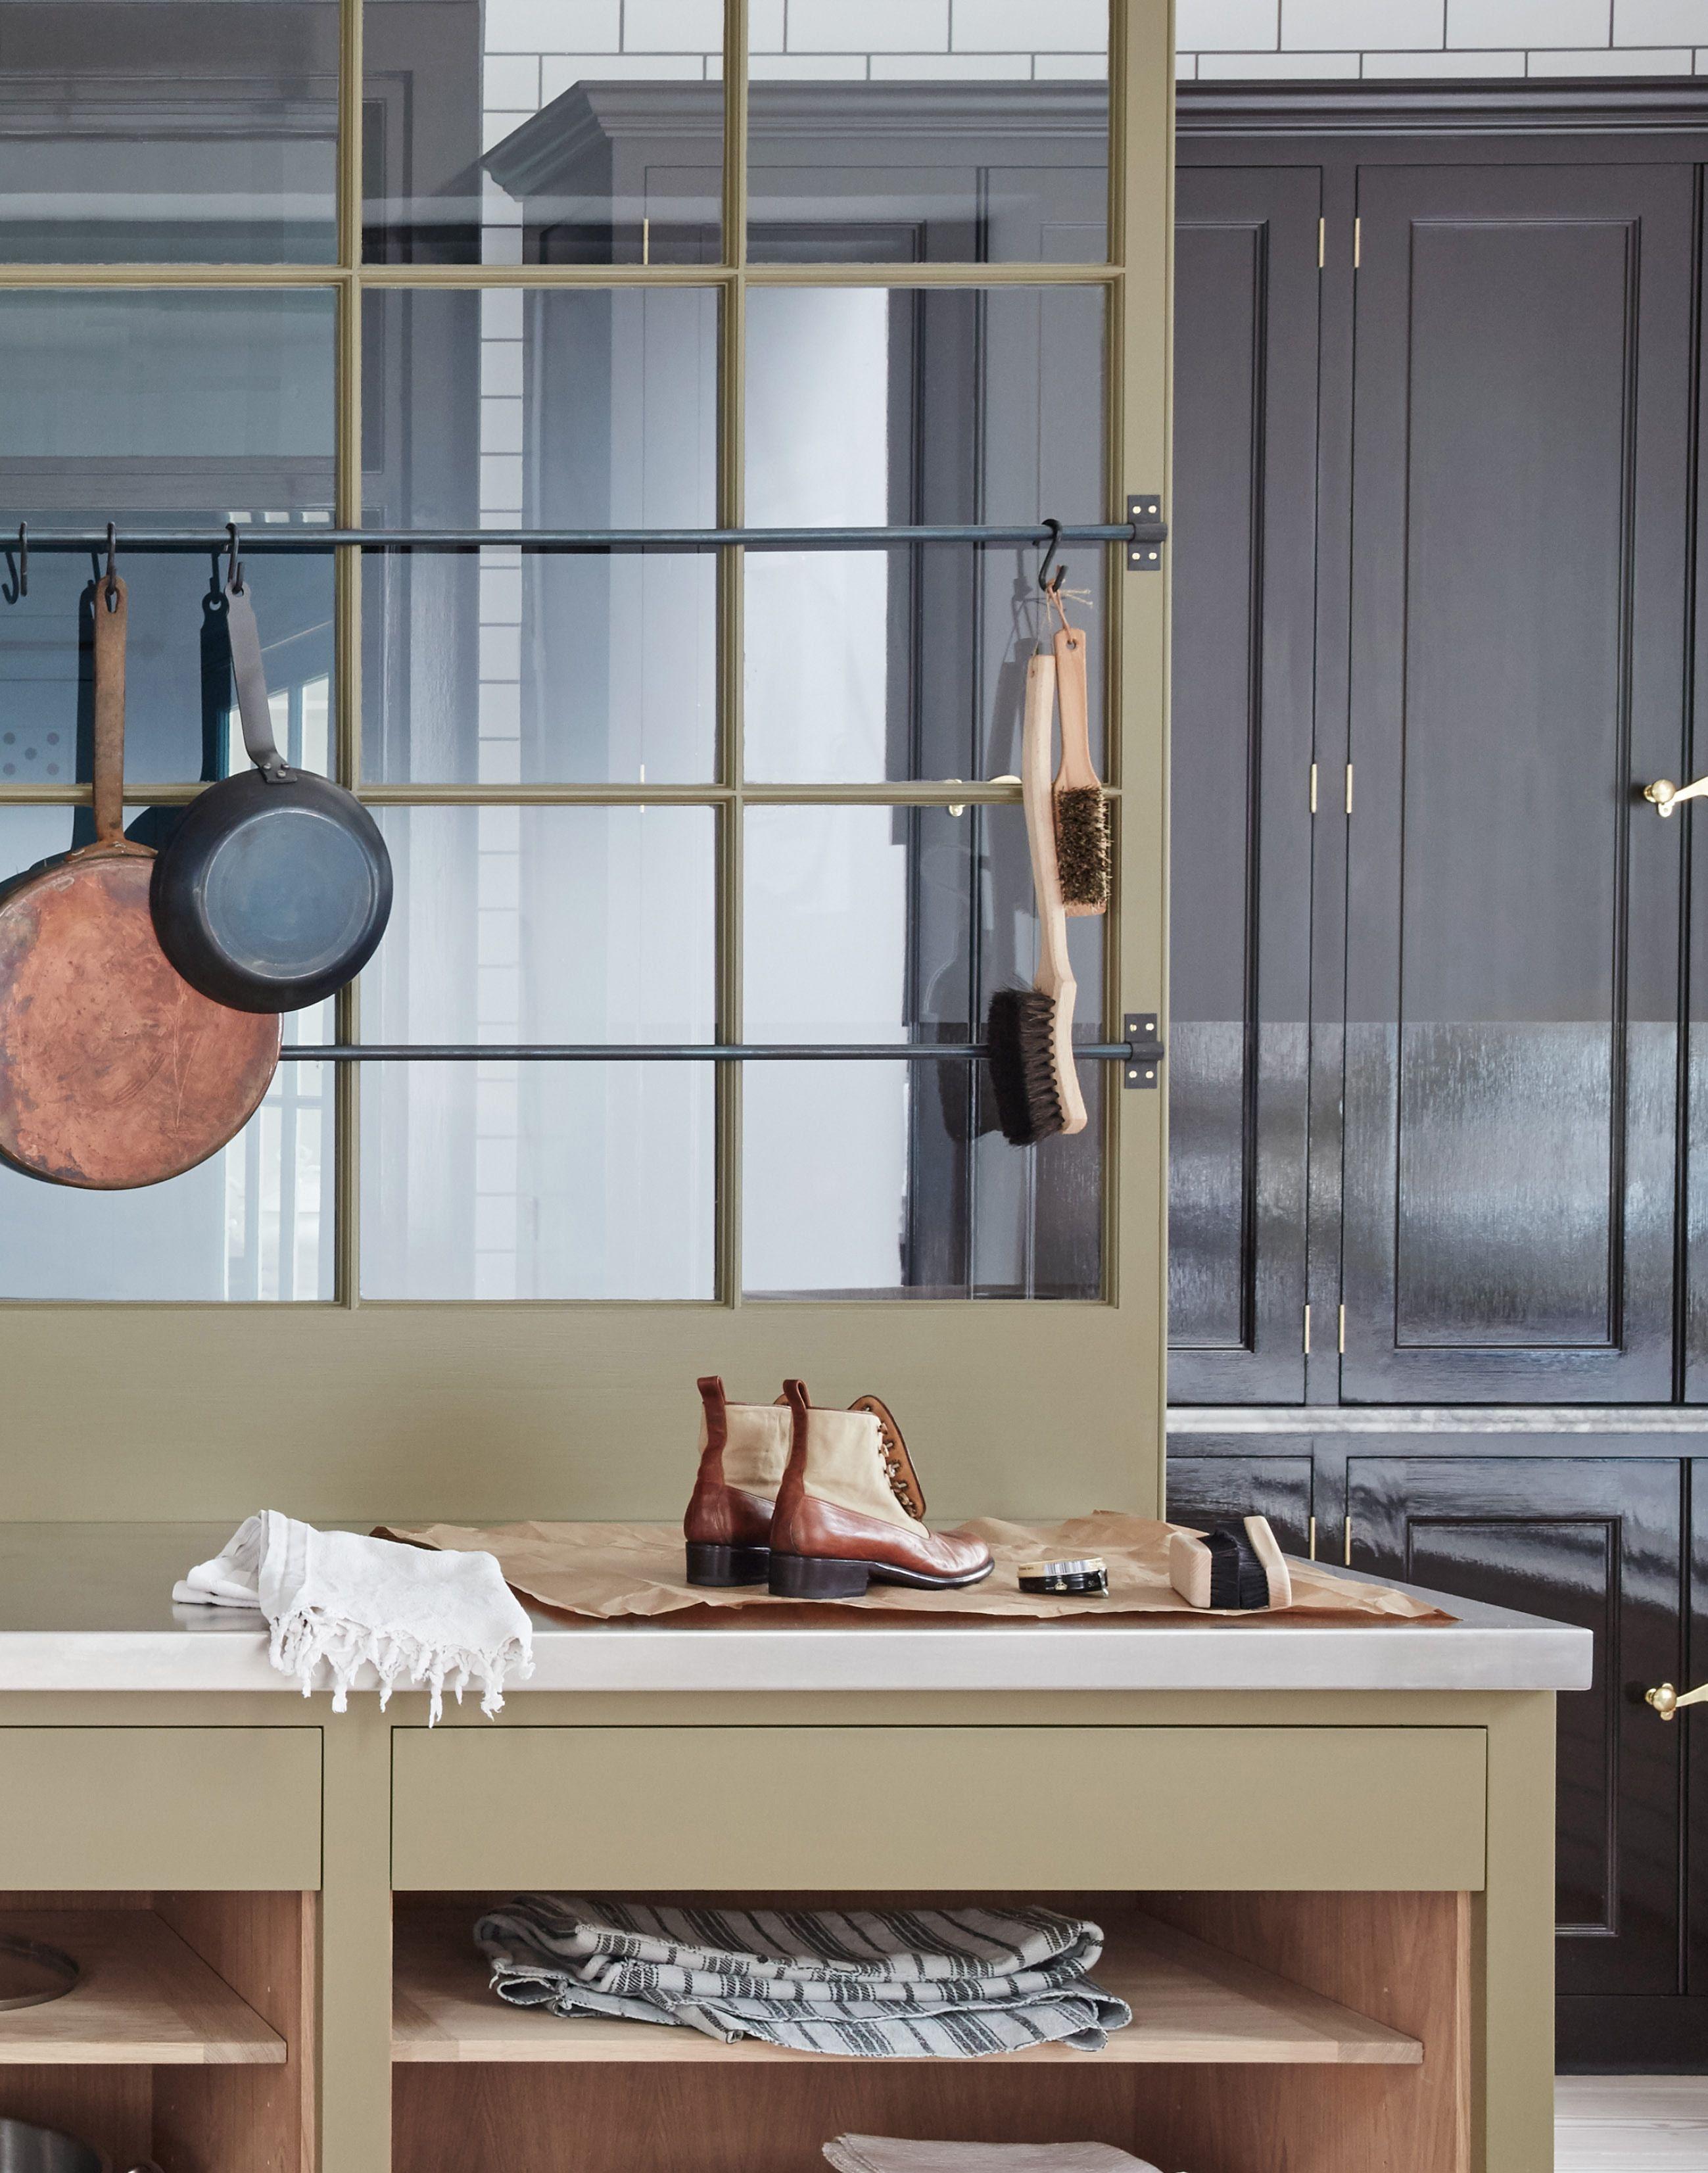 Plain English Marylebone Showroom | 'The Osea Kitchen' by Plain English | www.plainenglishdesign.co.uk #plainenglishkitchen